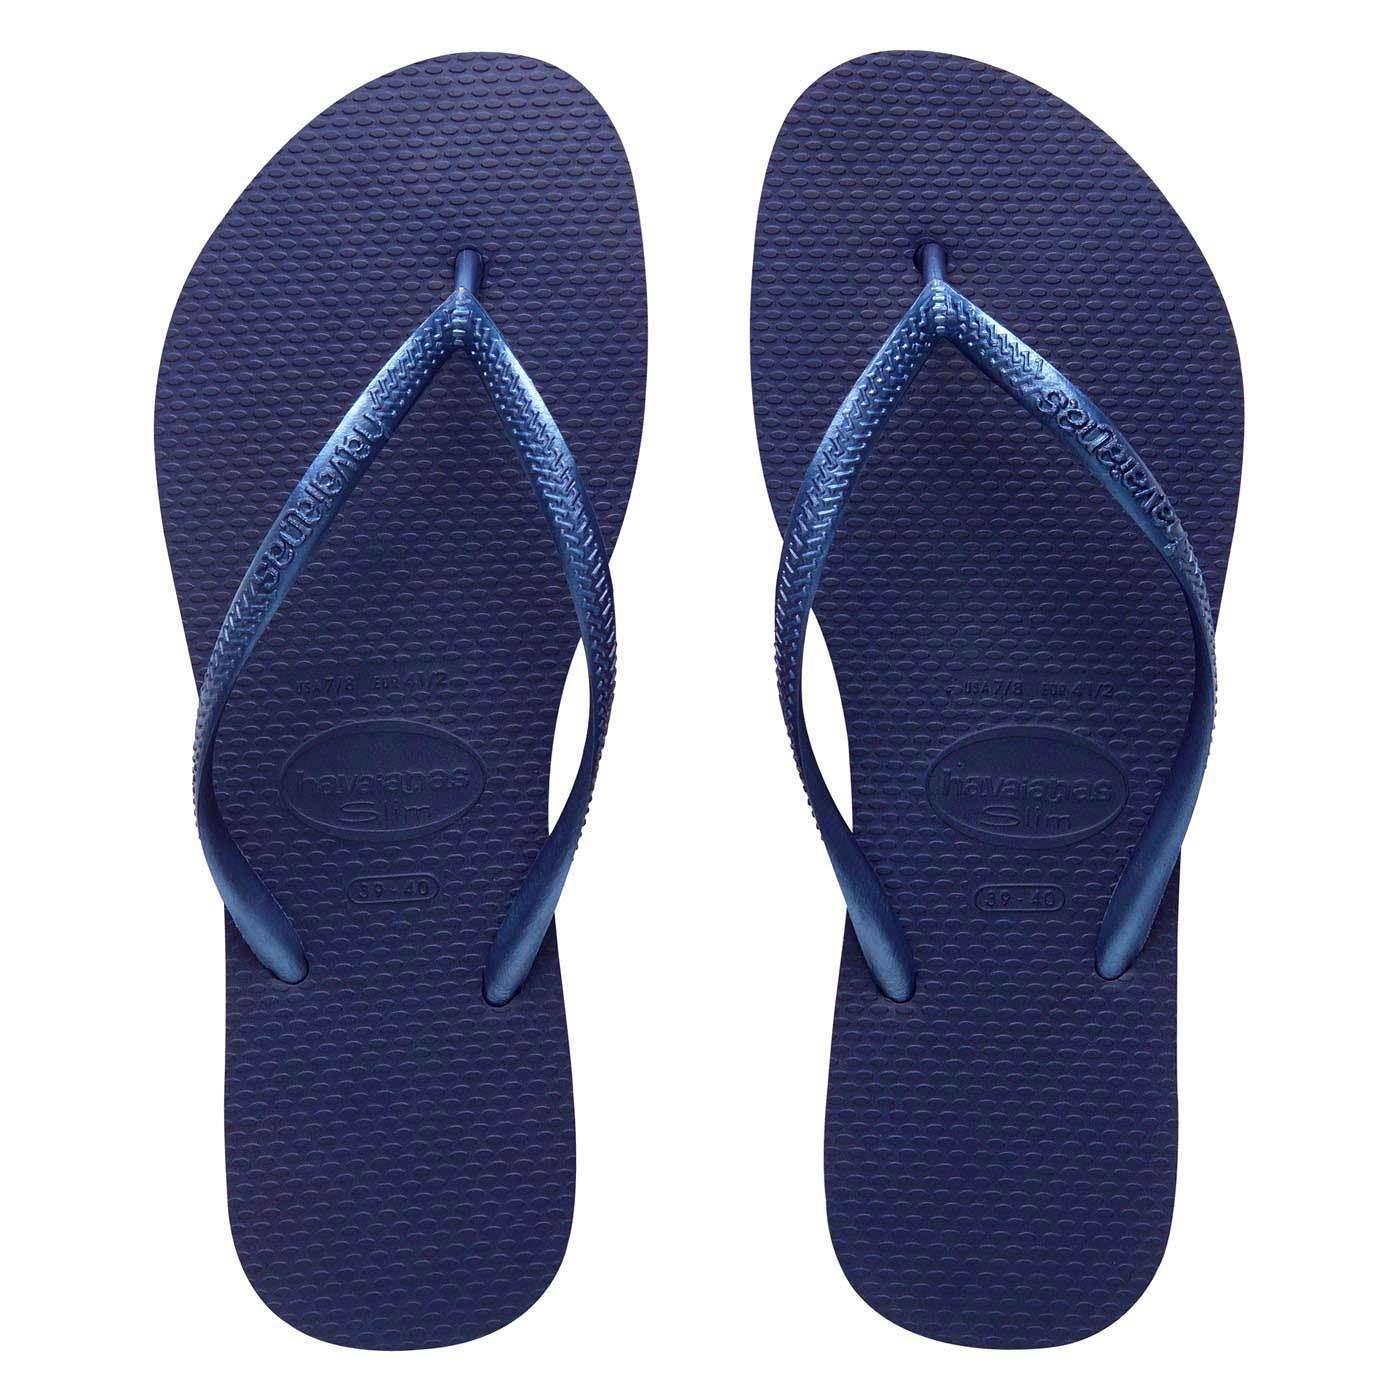 f55f1b2a425a Havaianas Slim Women Flip Flops Blue 39-40 BR   9-10 US   41-42 E -  22.11